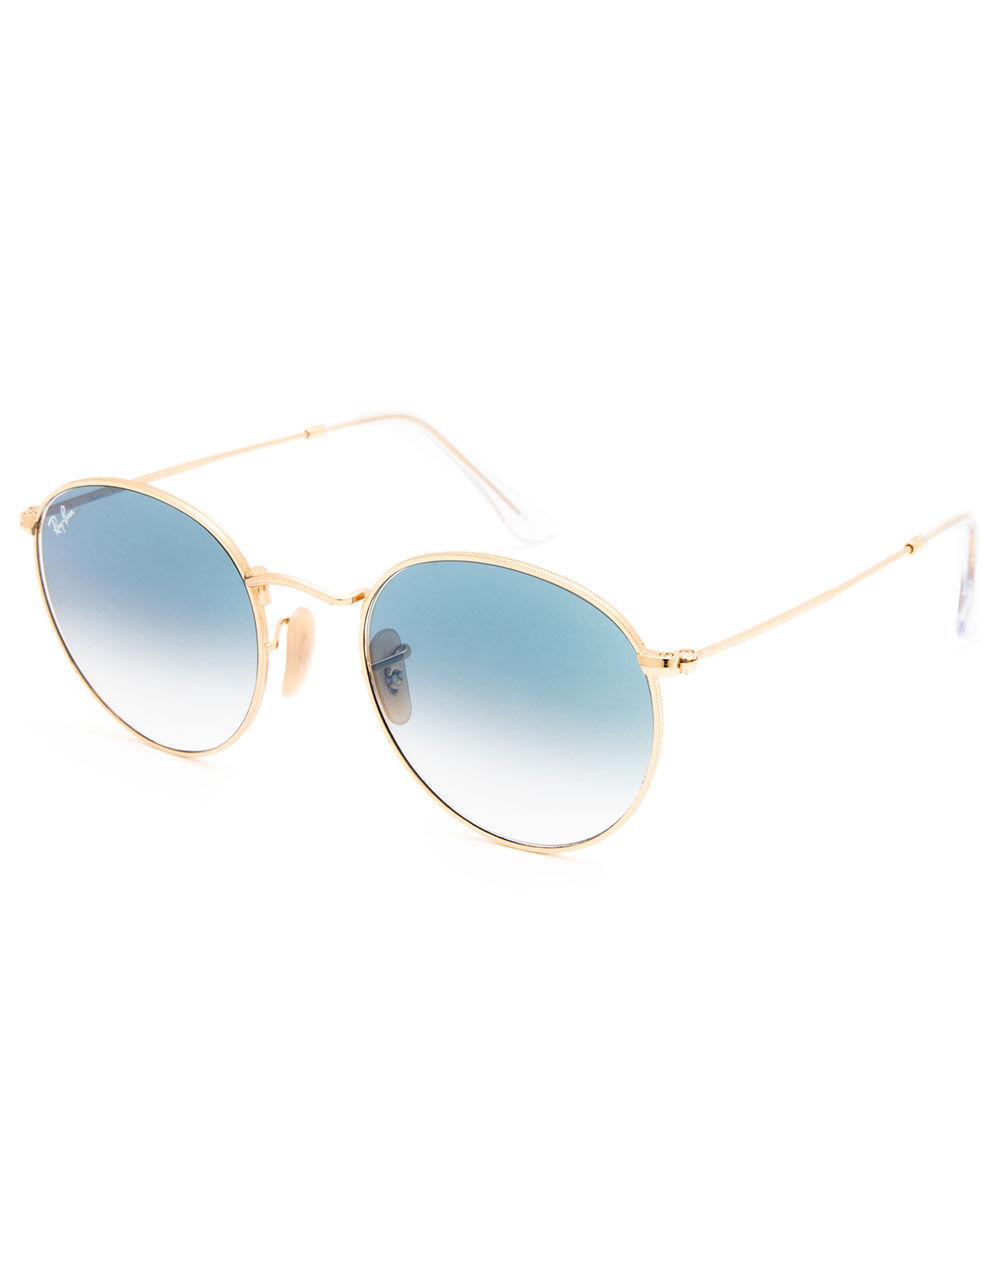 RAY-BAN Round Flat Lenses Light Blue Gradient & Gold Sunglasses